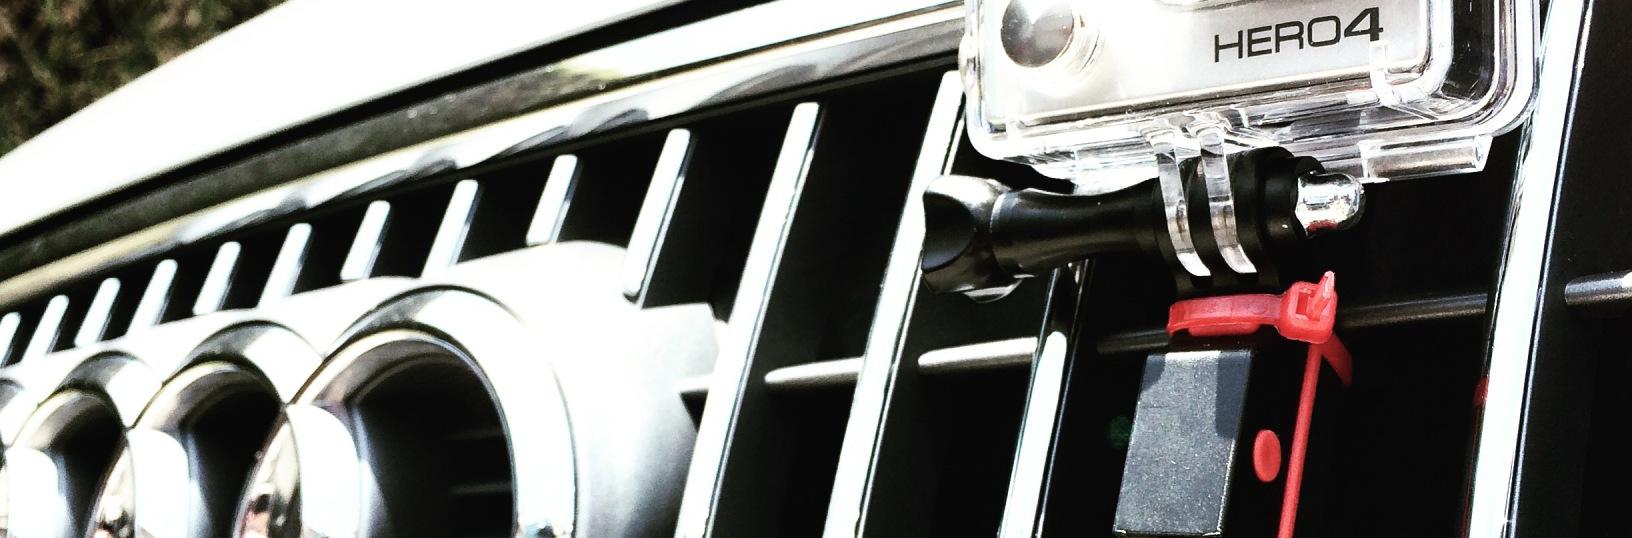 Audi_grille